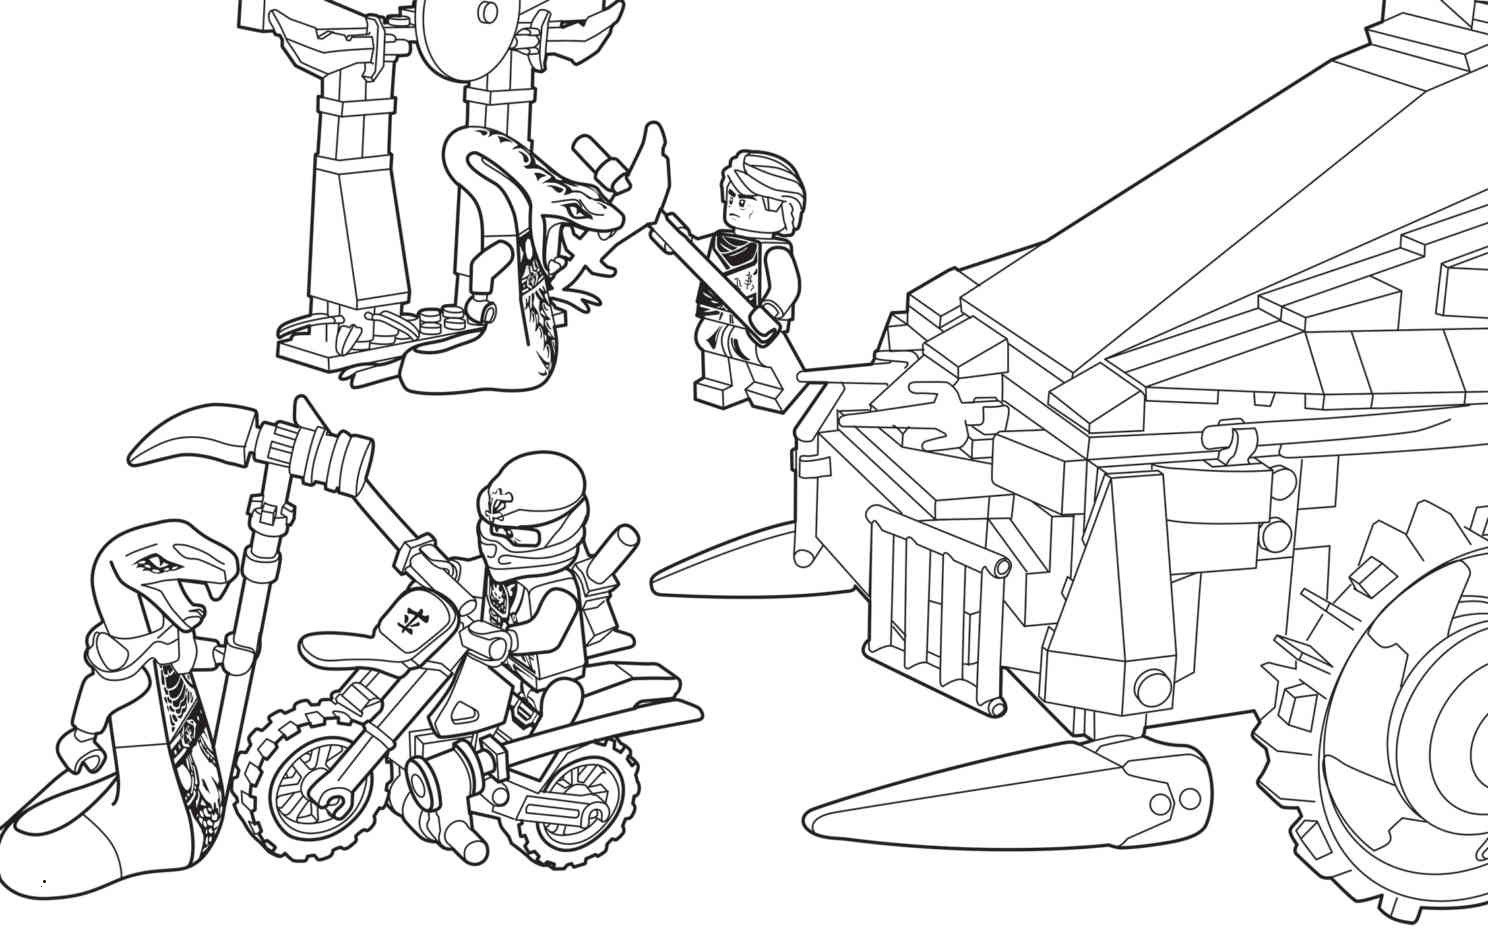 Ninjago Lloyd Ausmalbild Inspirierend 40 Inspiration Ninjago Goldener Ninja Ausmalbilder Treehouse Nyc Bild